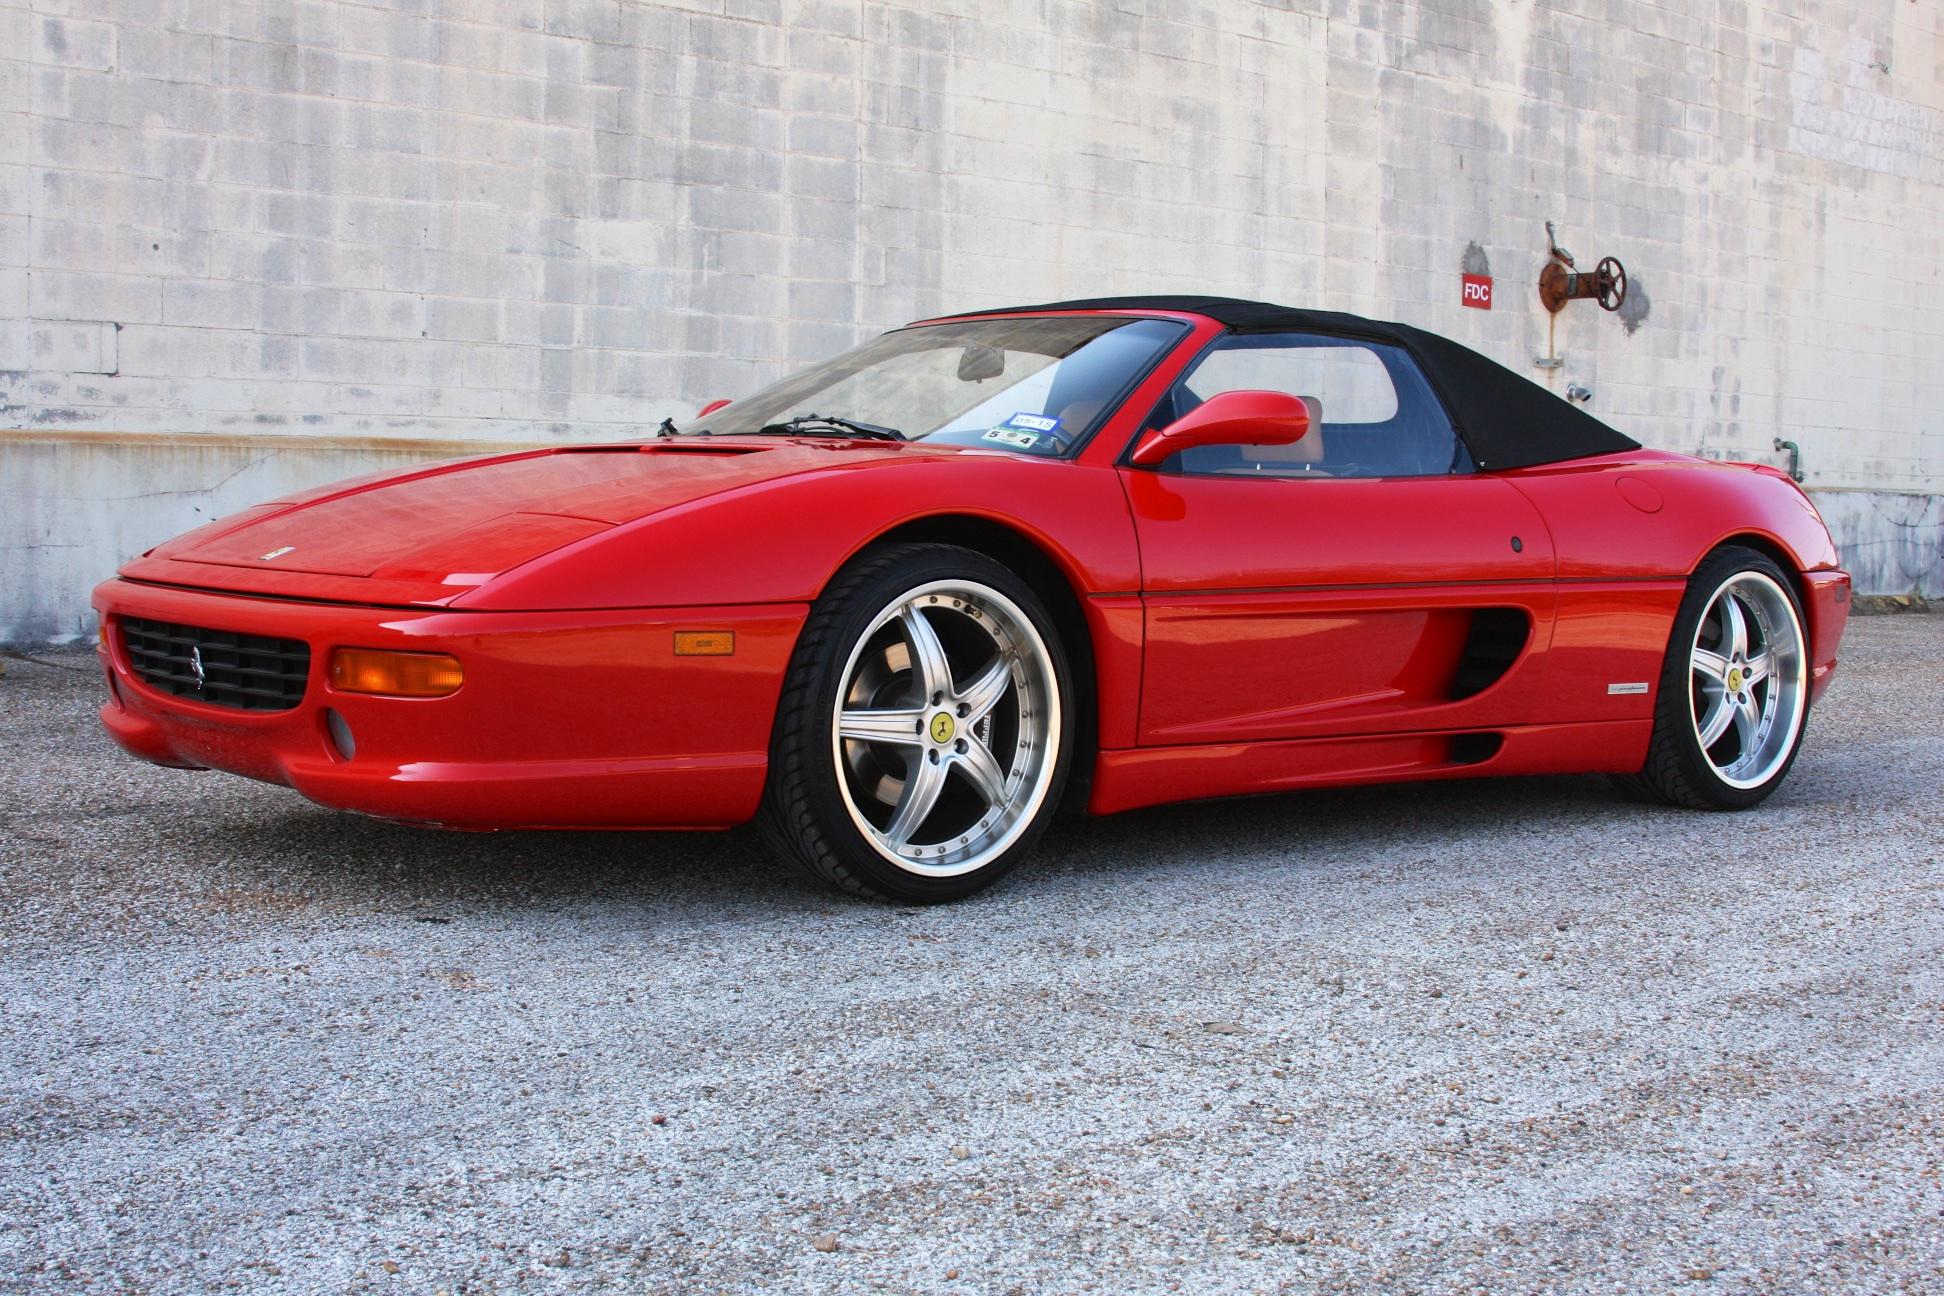 1996 Ferrari F355 Spider (T0105008) - 16.jpg